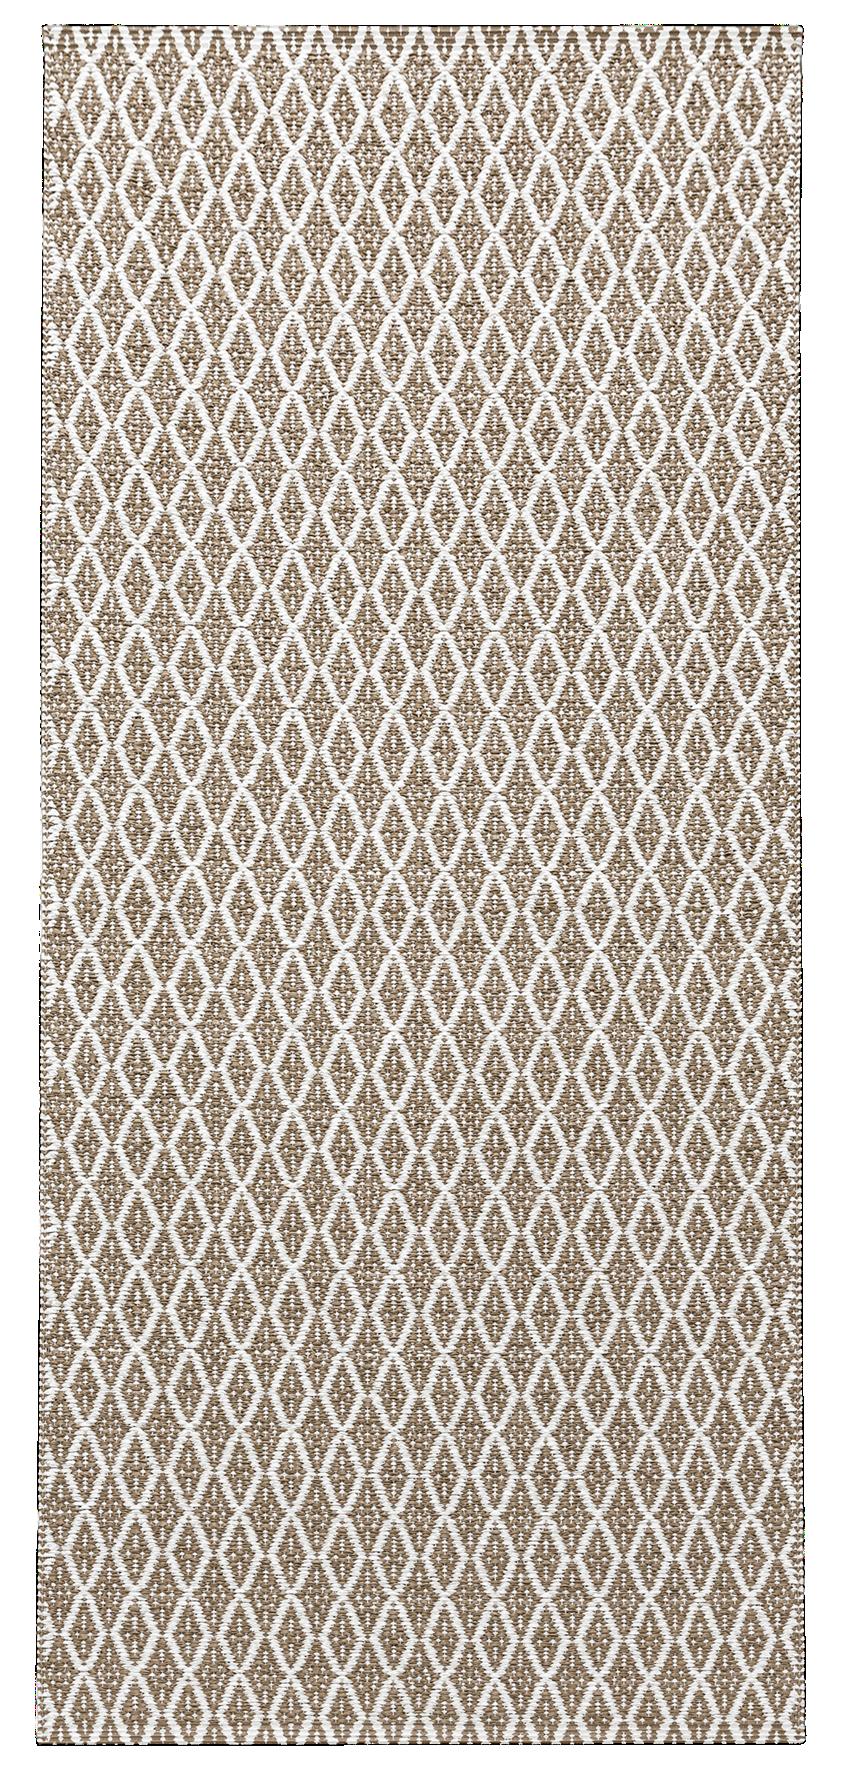 Horredsmattan - Plastmatta Eye 70 x 250 cm - Natur